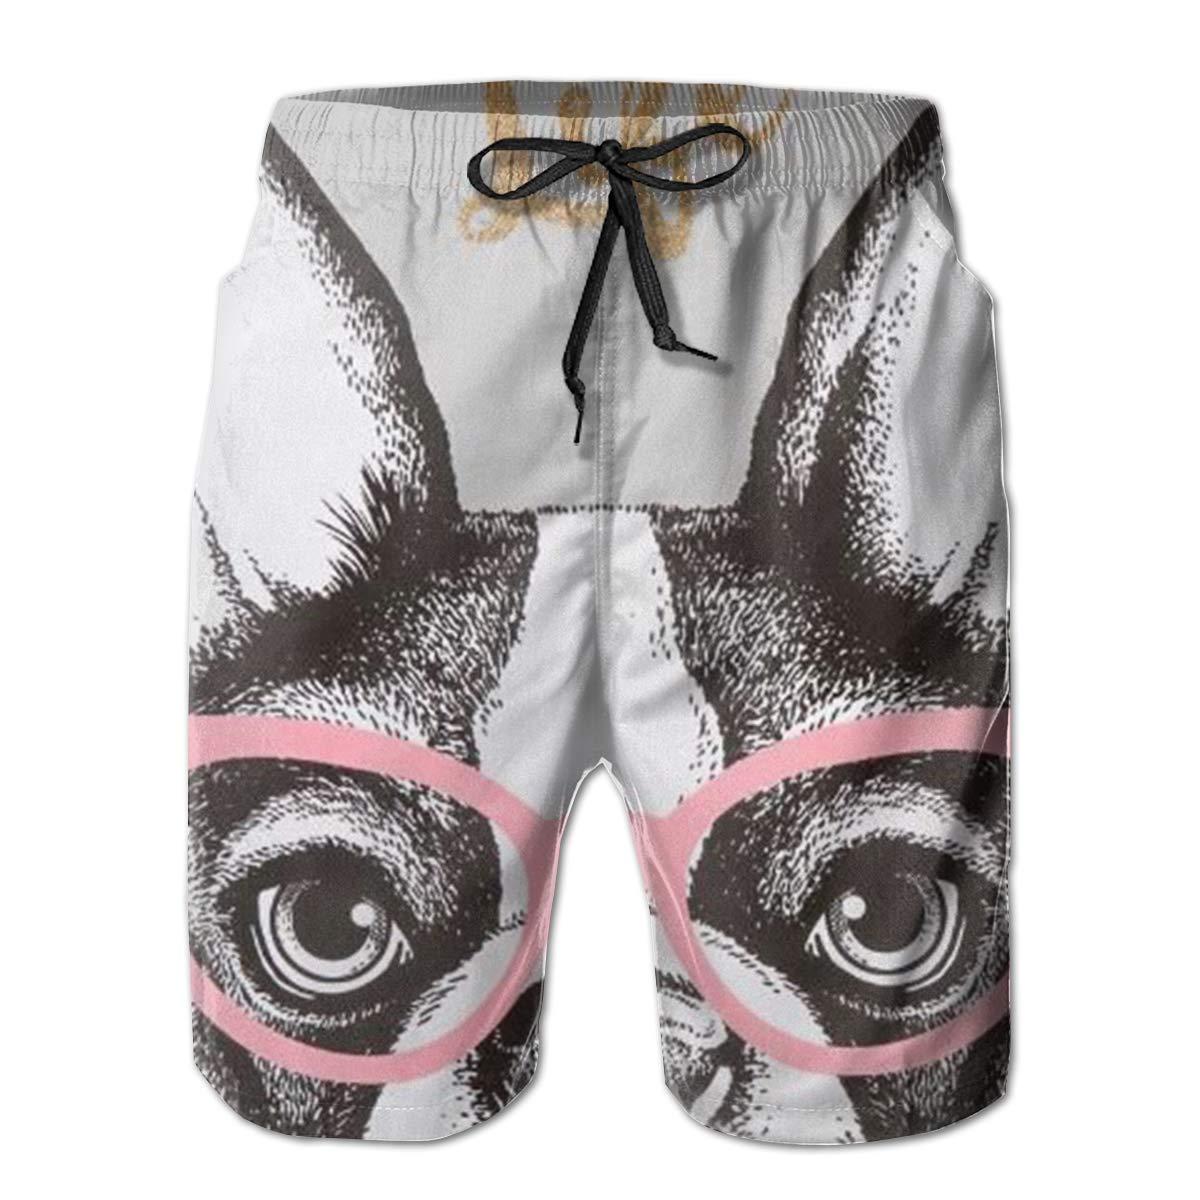 Tyugvvo French Bulldog with Glasses Funny Swim Trunks Quick Dry Beachwear Sports Running Swim Board Shorts Mesh Lining